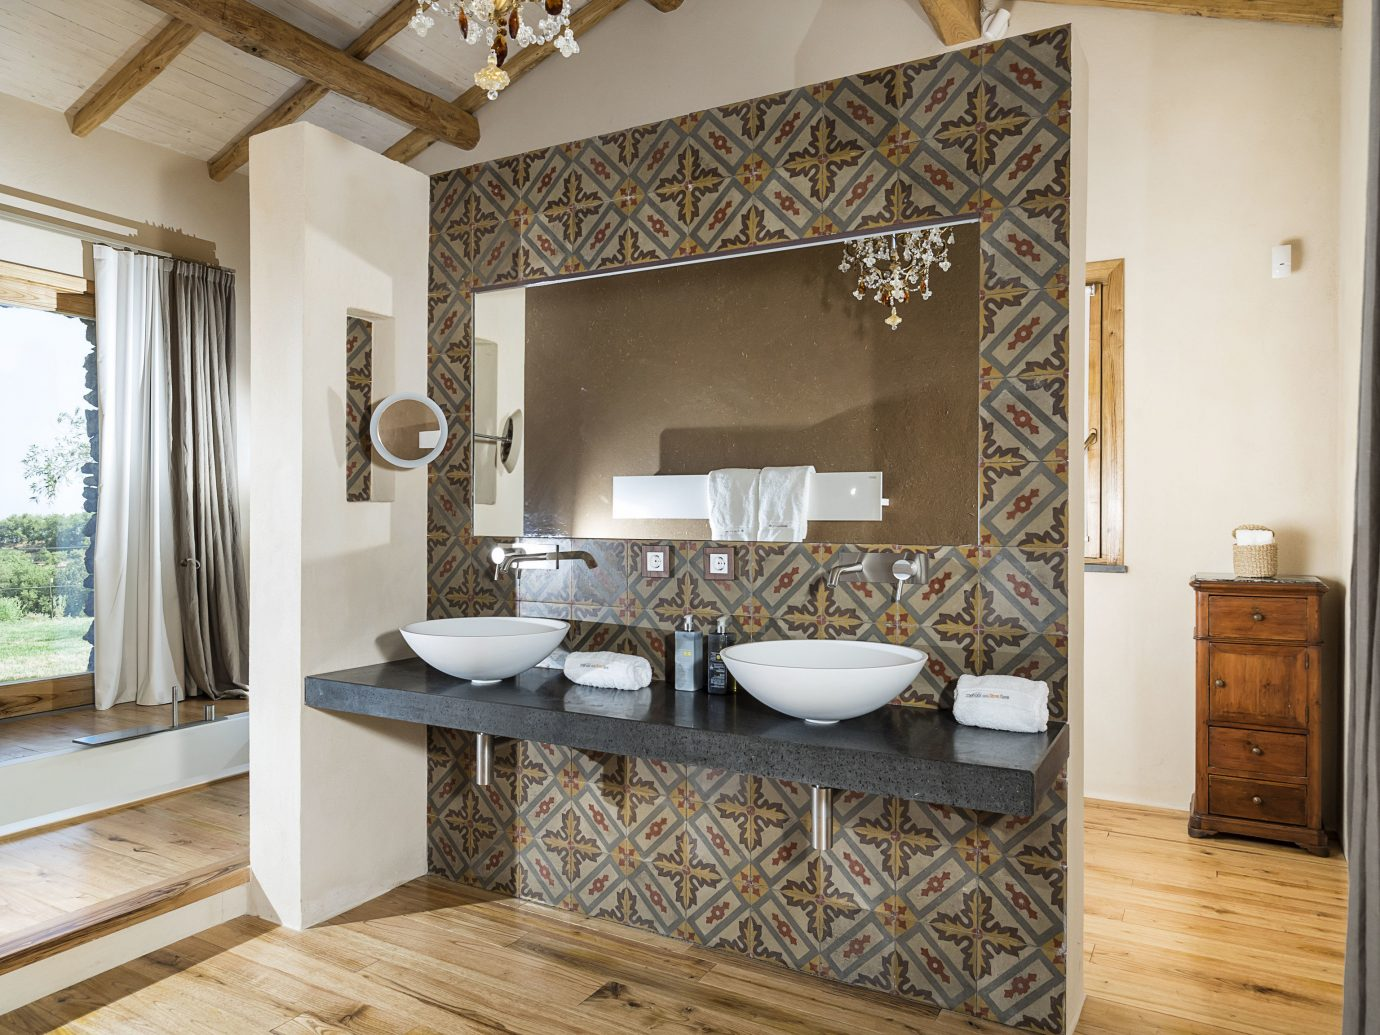 Trip Ideas indoor wall floor bathroom room interior design sink flooring ceiling estate tile interior designer wood flooring furniture tub Bath